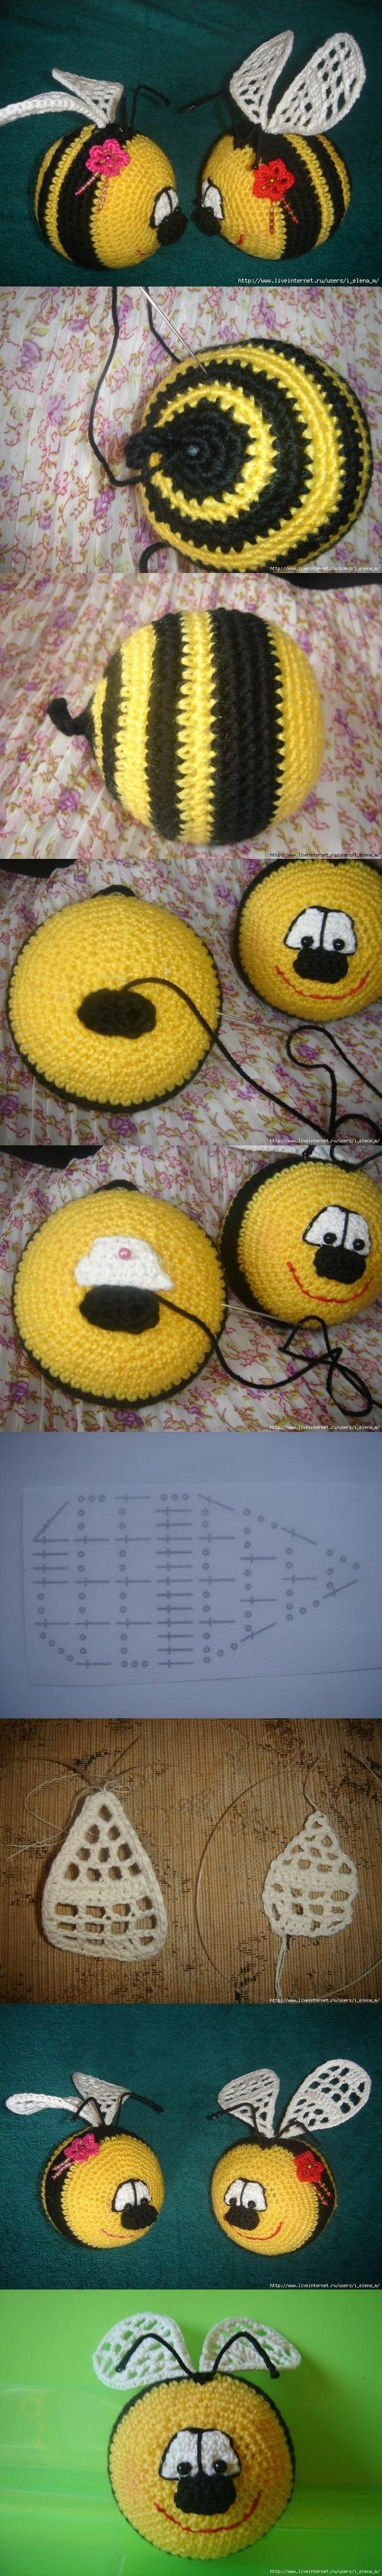 DIY Crochet Smiley Bee DIY Crochet Smiley Bee